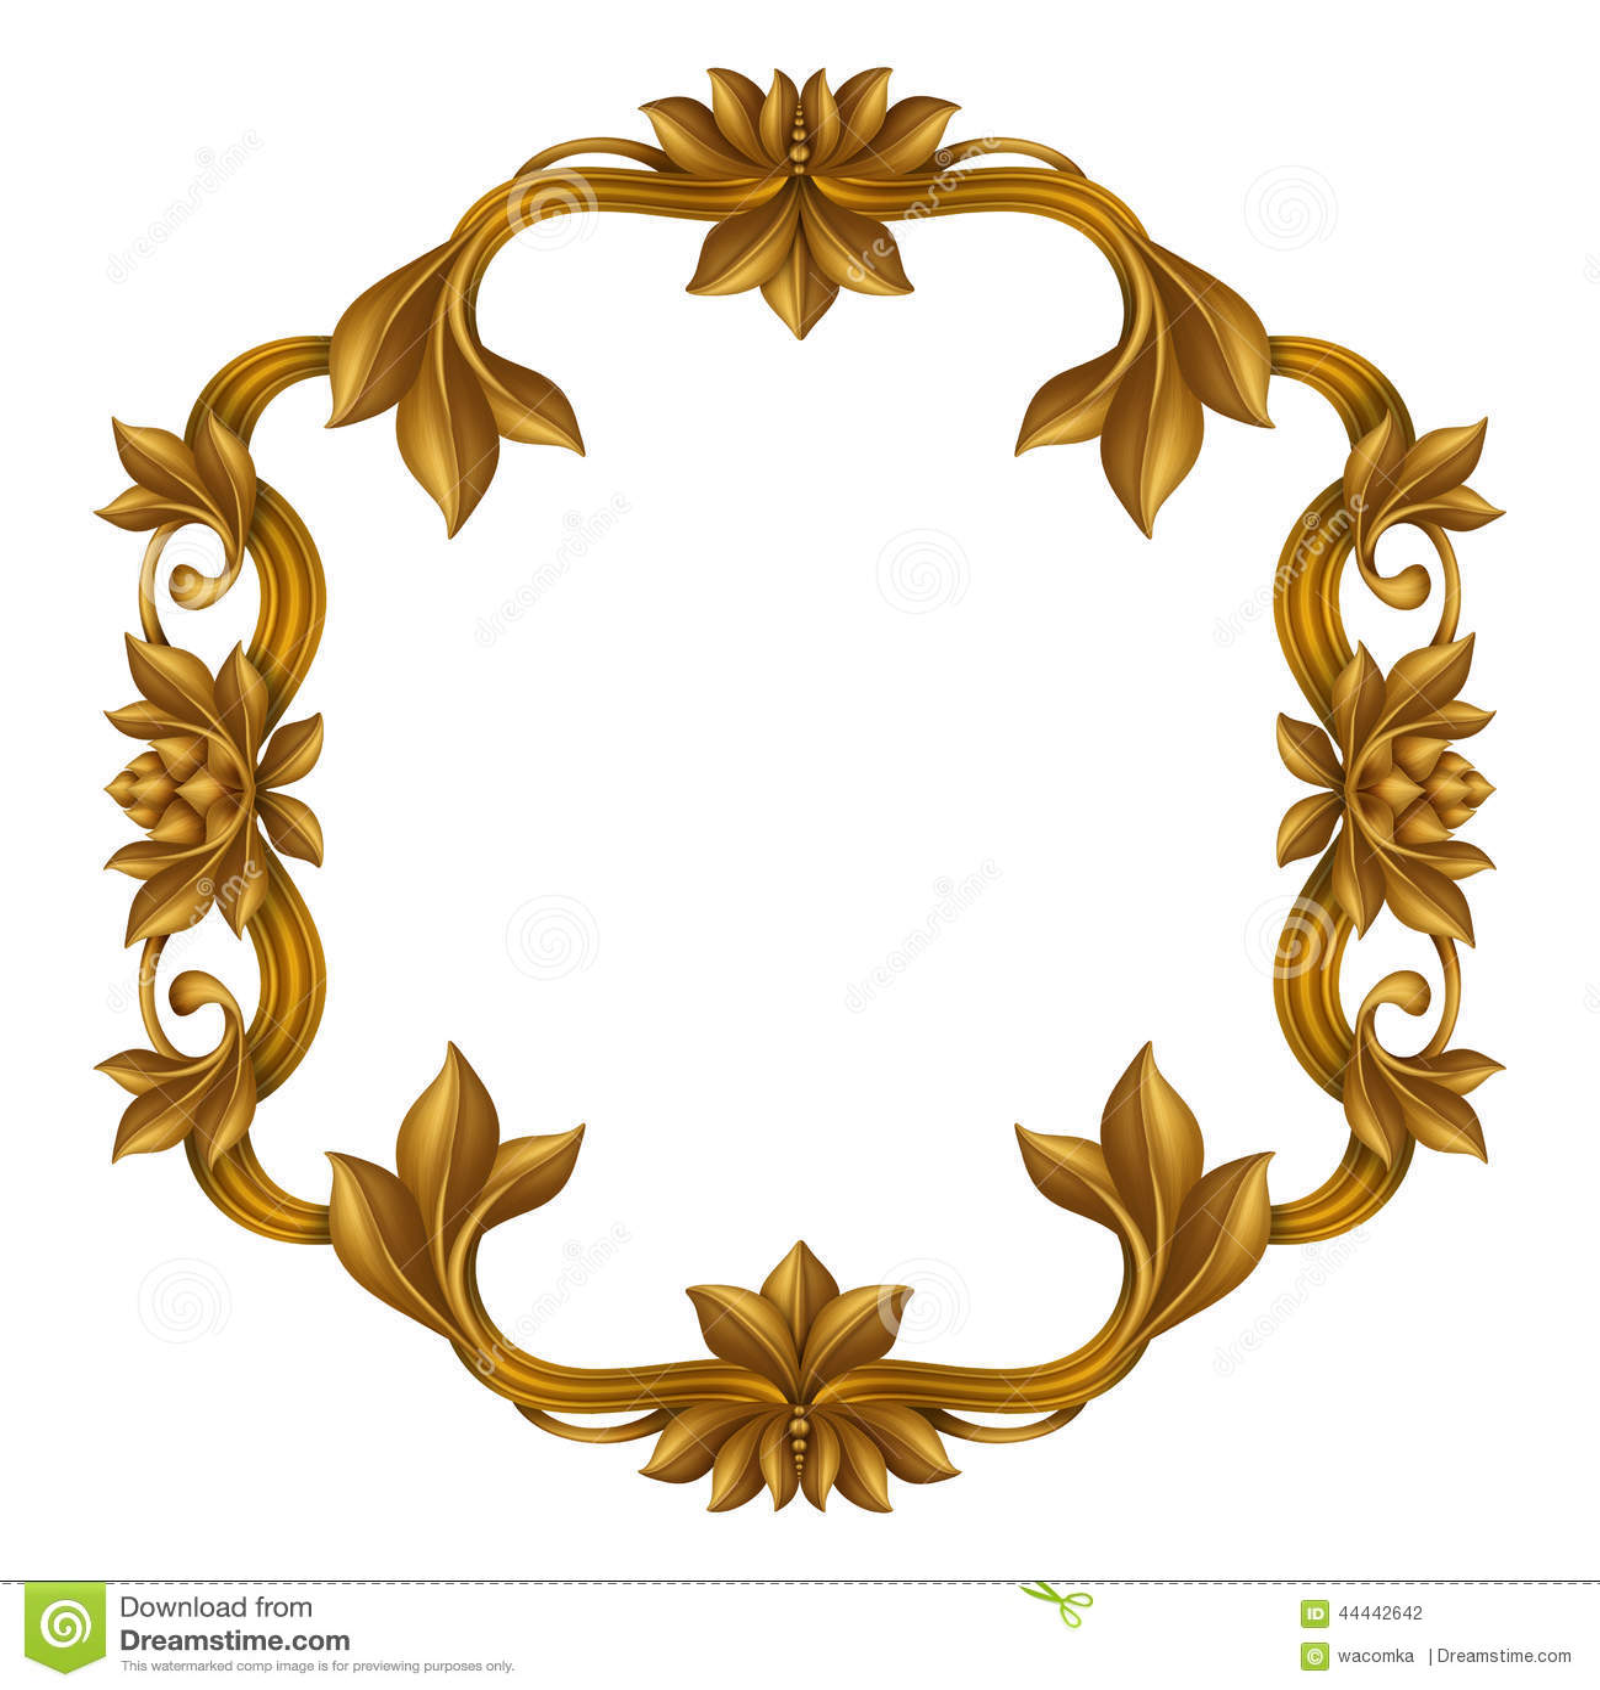 decorative gold vintage frame isolated on white background, festive